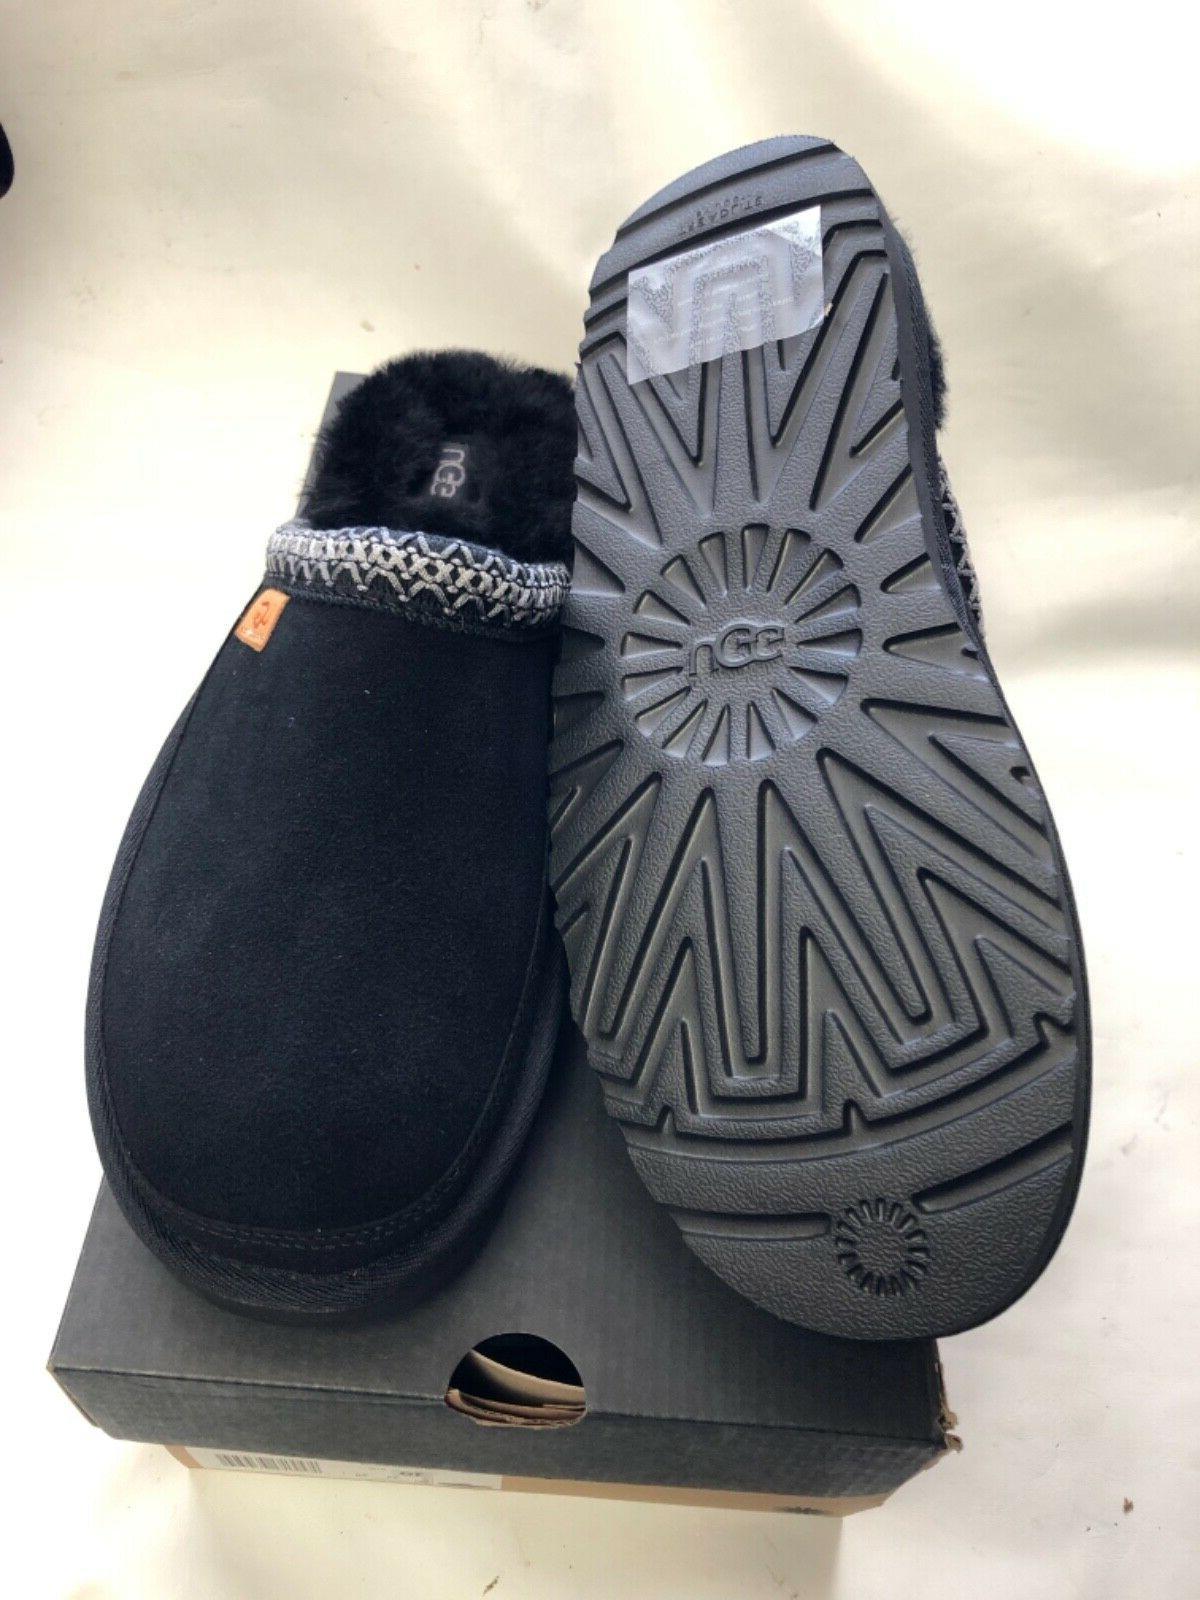 UGG Men's 1103900 BLACK TNL 9-14